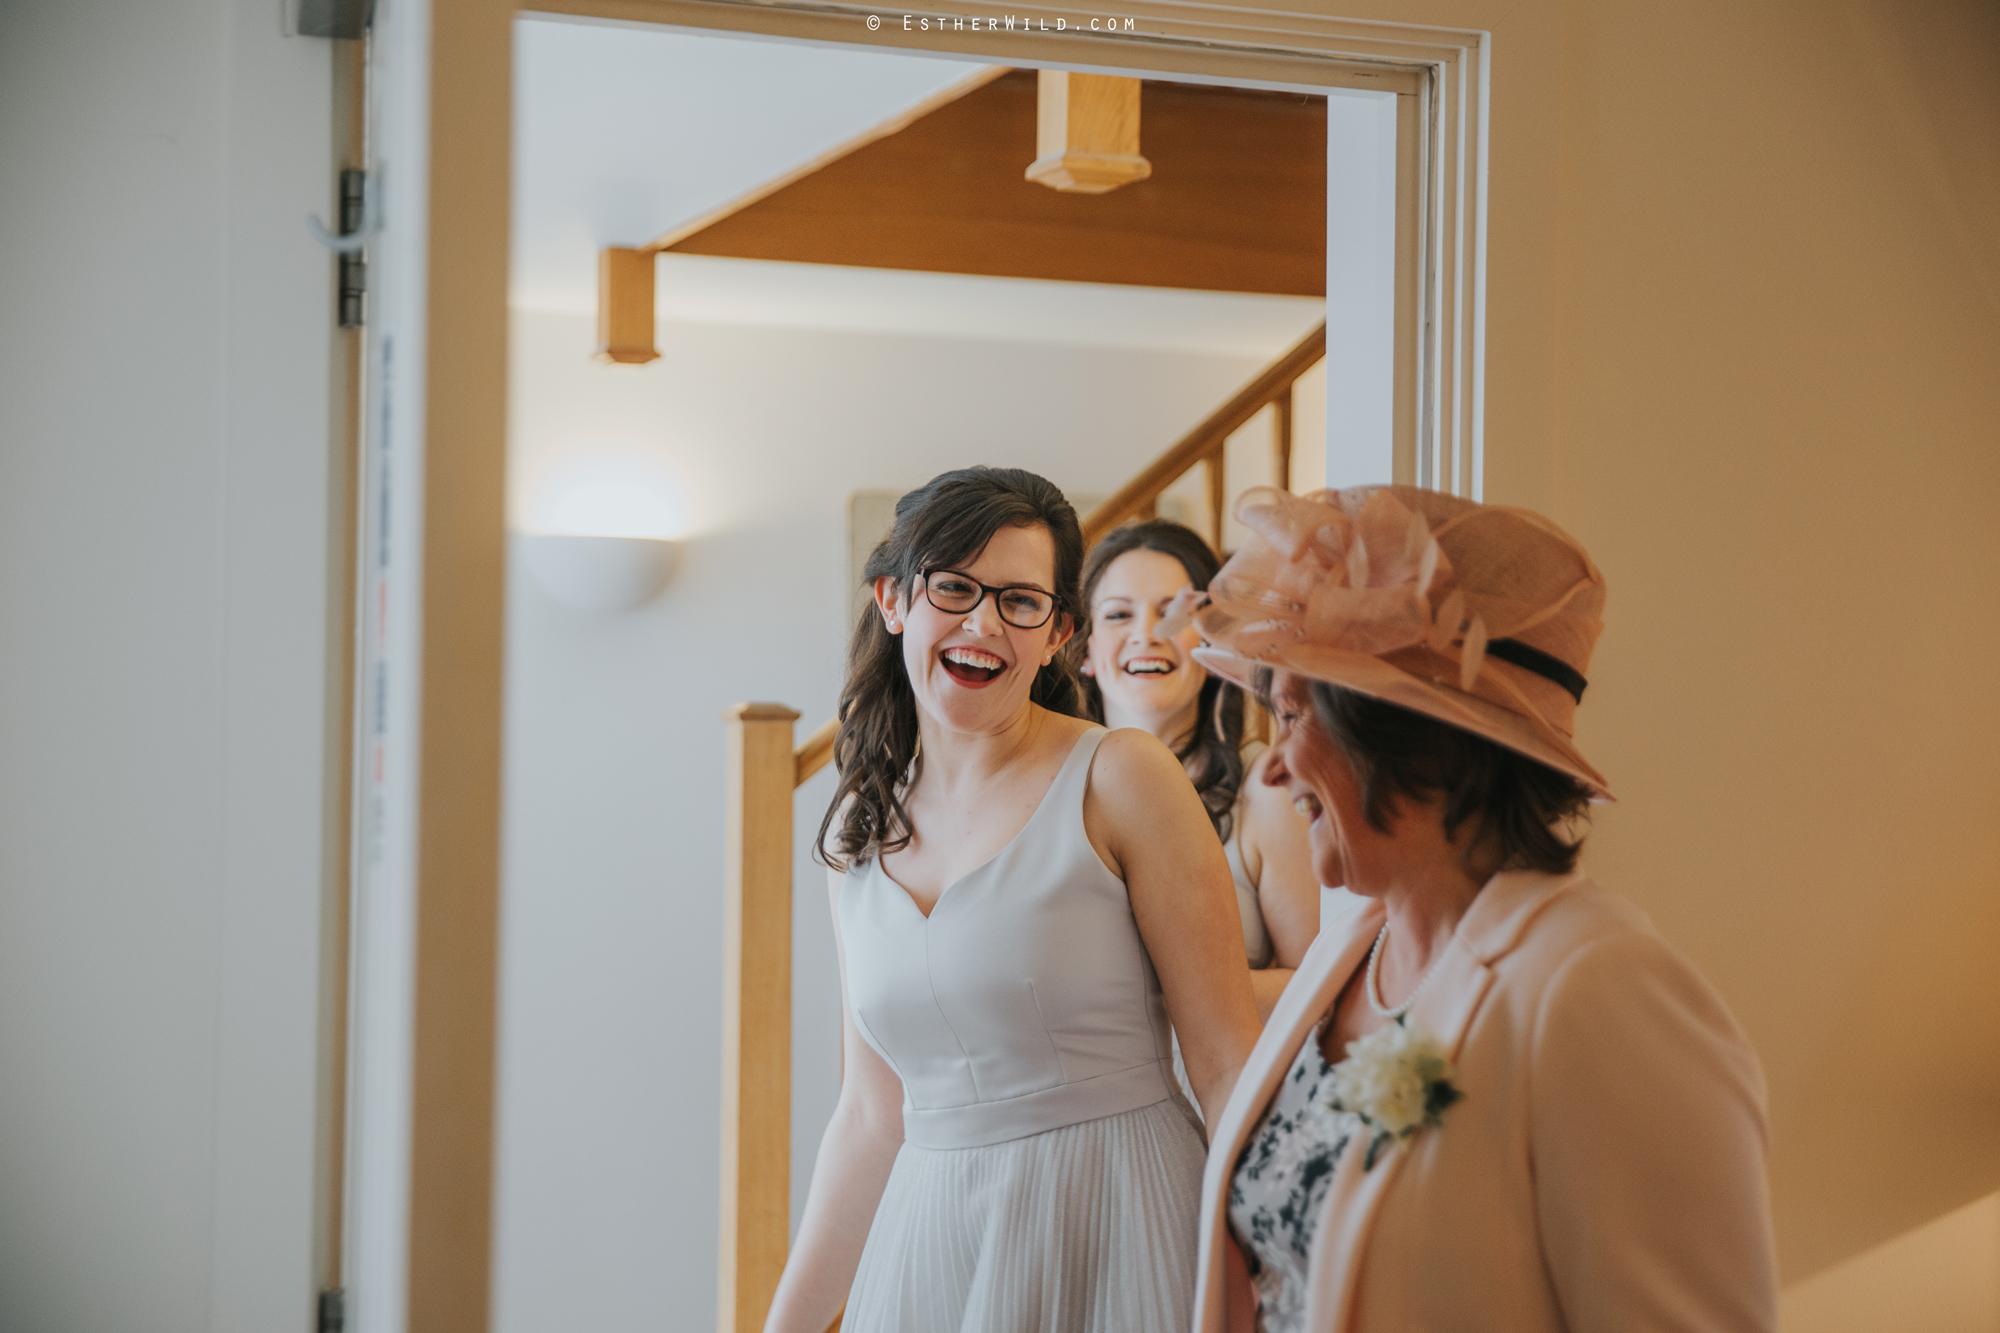 Elms_Barn_Weddings_Suffolk_Photographer_Copyright_Esther_Wild_IMG_0563.jpg